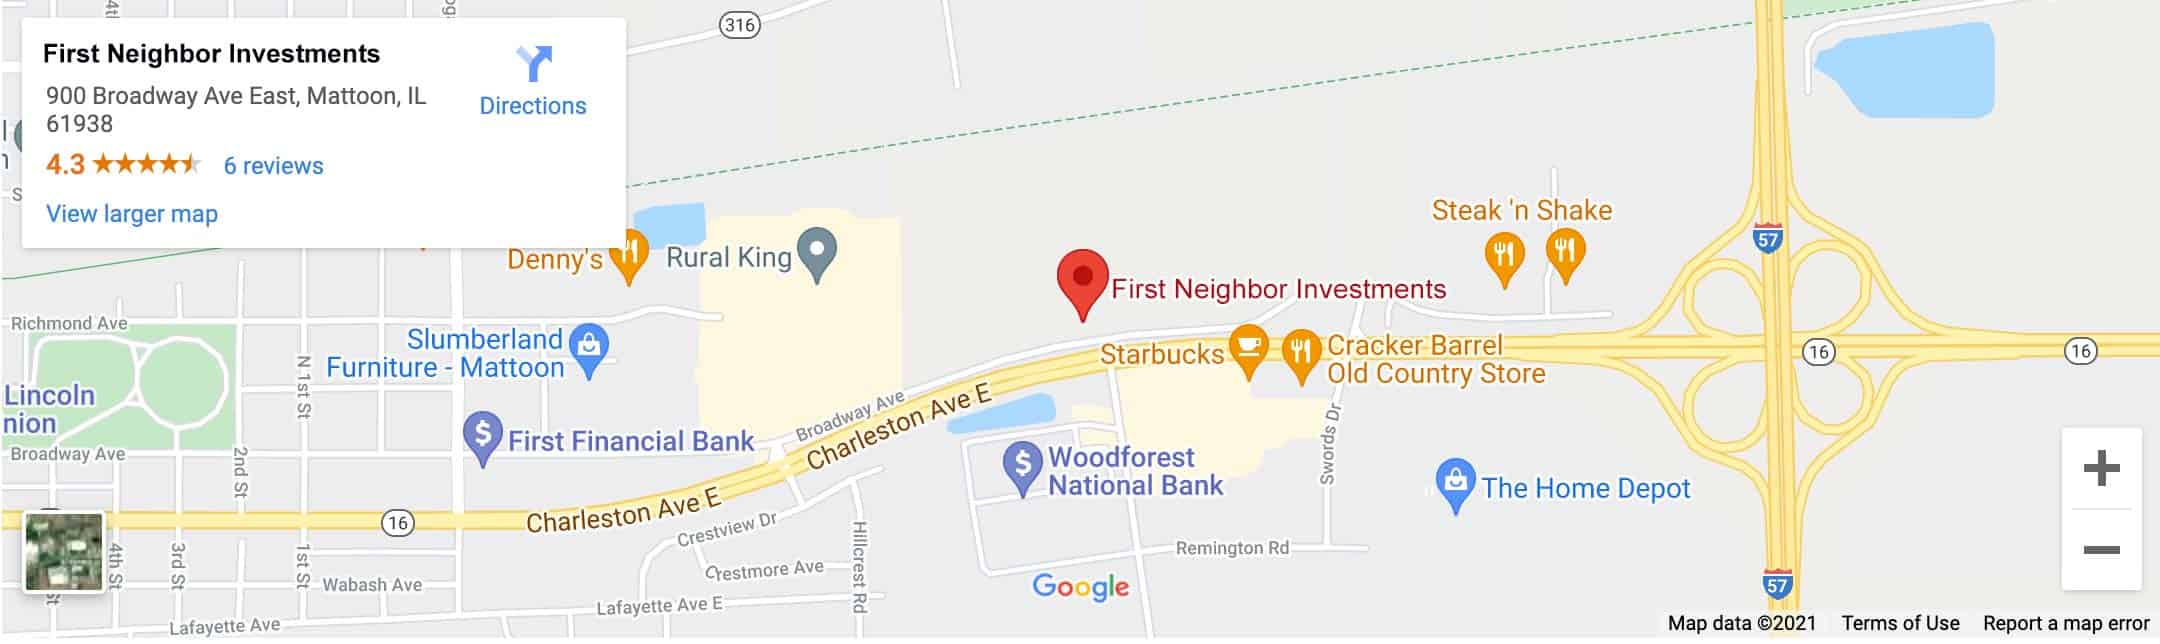 Decorative - First Neighbor Investments Mattoon Google Map Image